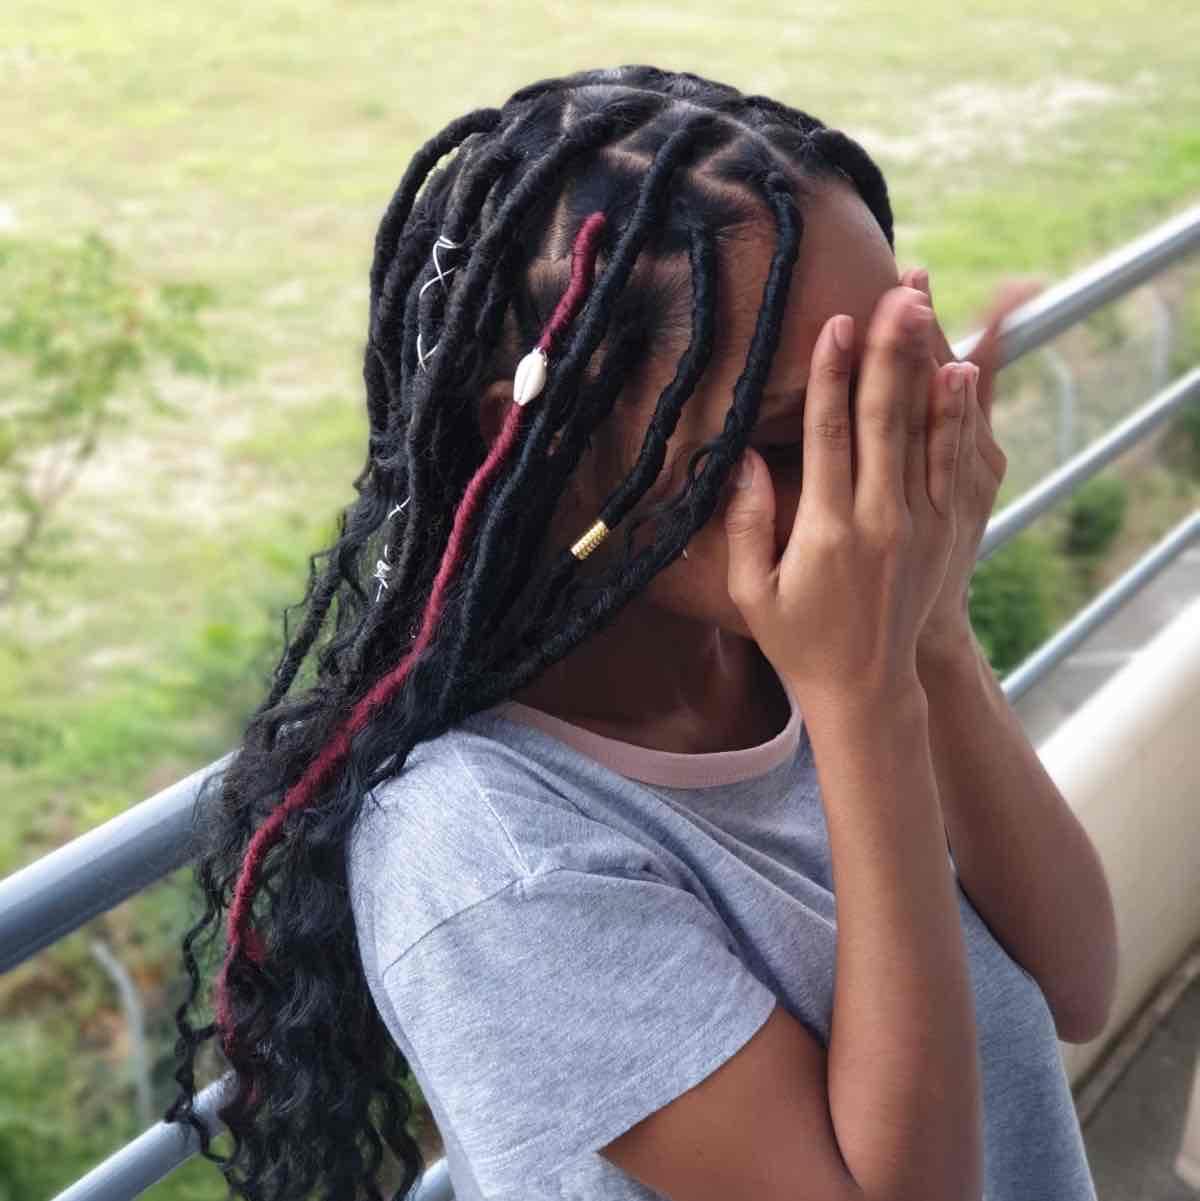 salon de coiffure afro tresse tresses box braids crochet braids vanilles tissages paris 75 77 78 91 92 93 94 95 JHFXUNJA